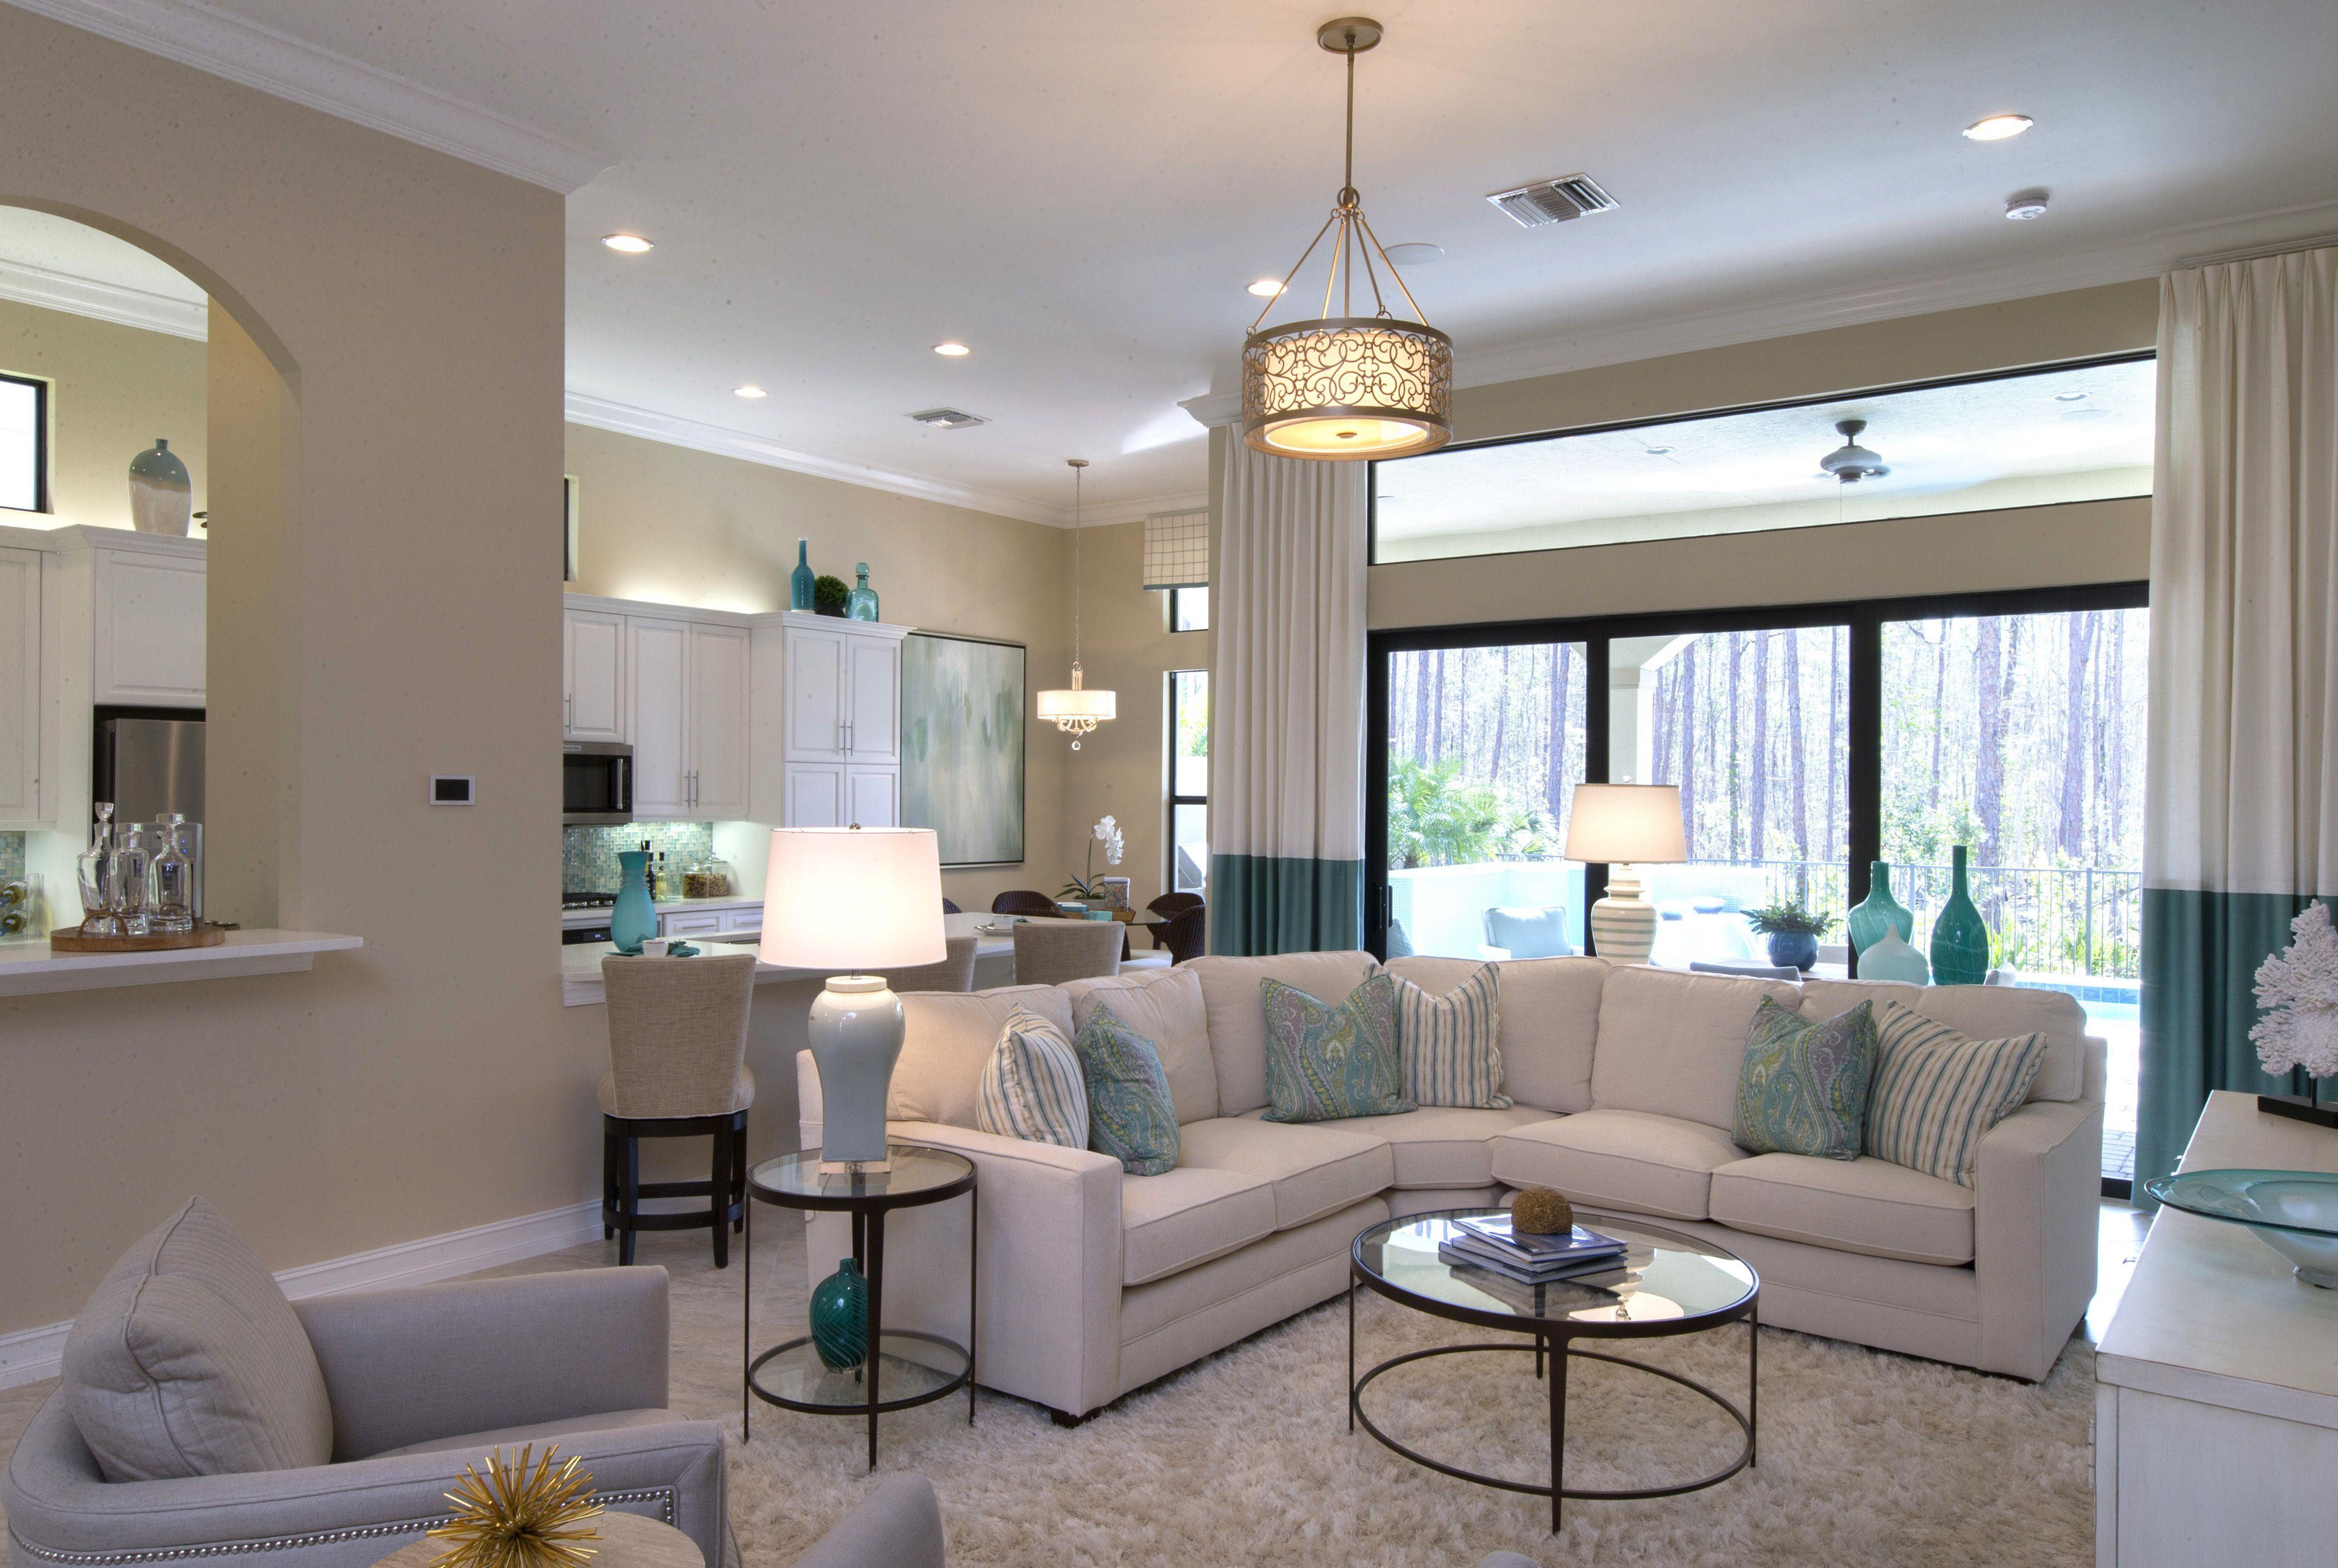 Pin by Deborah Cotten on living room Home interior